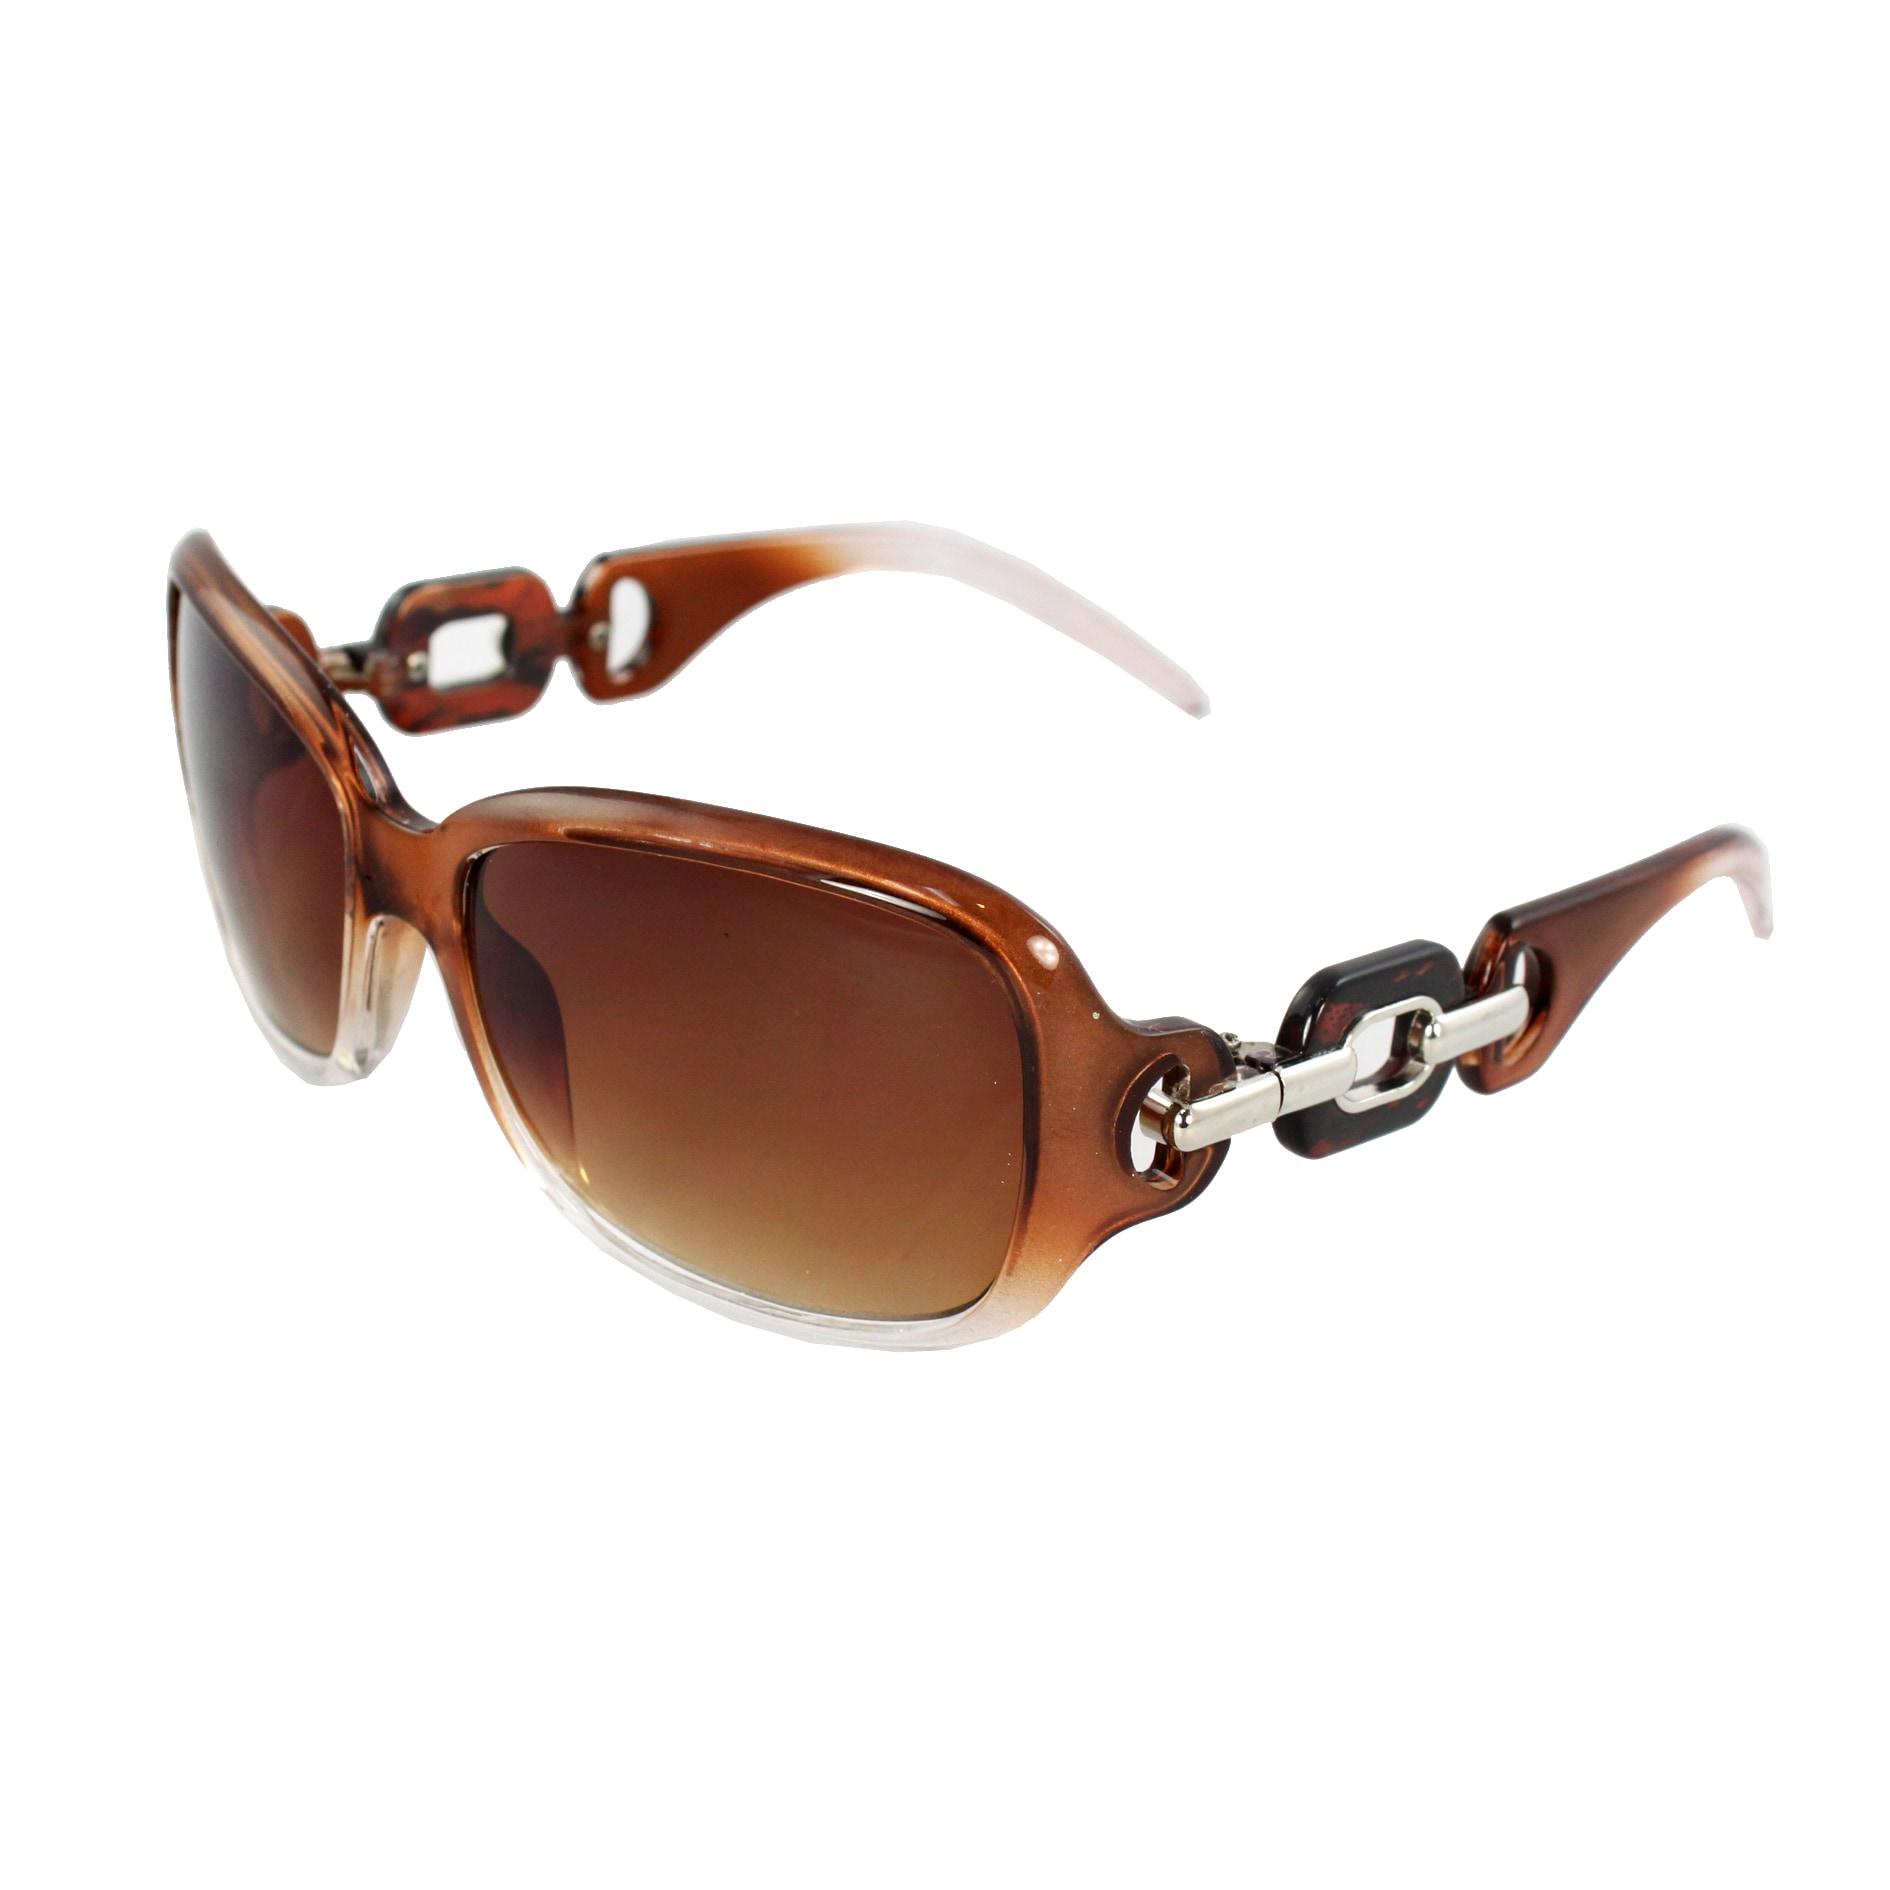 Square Fashion Sunglasses Brown Clear 2tone Frame Amber ...